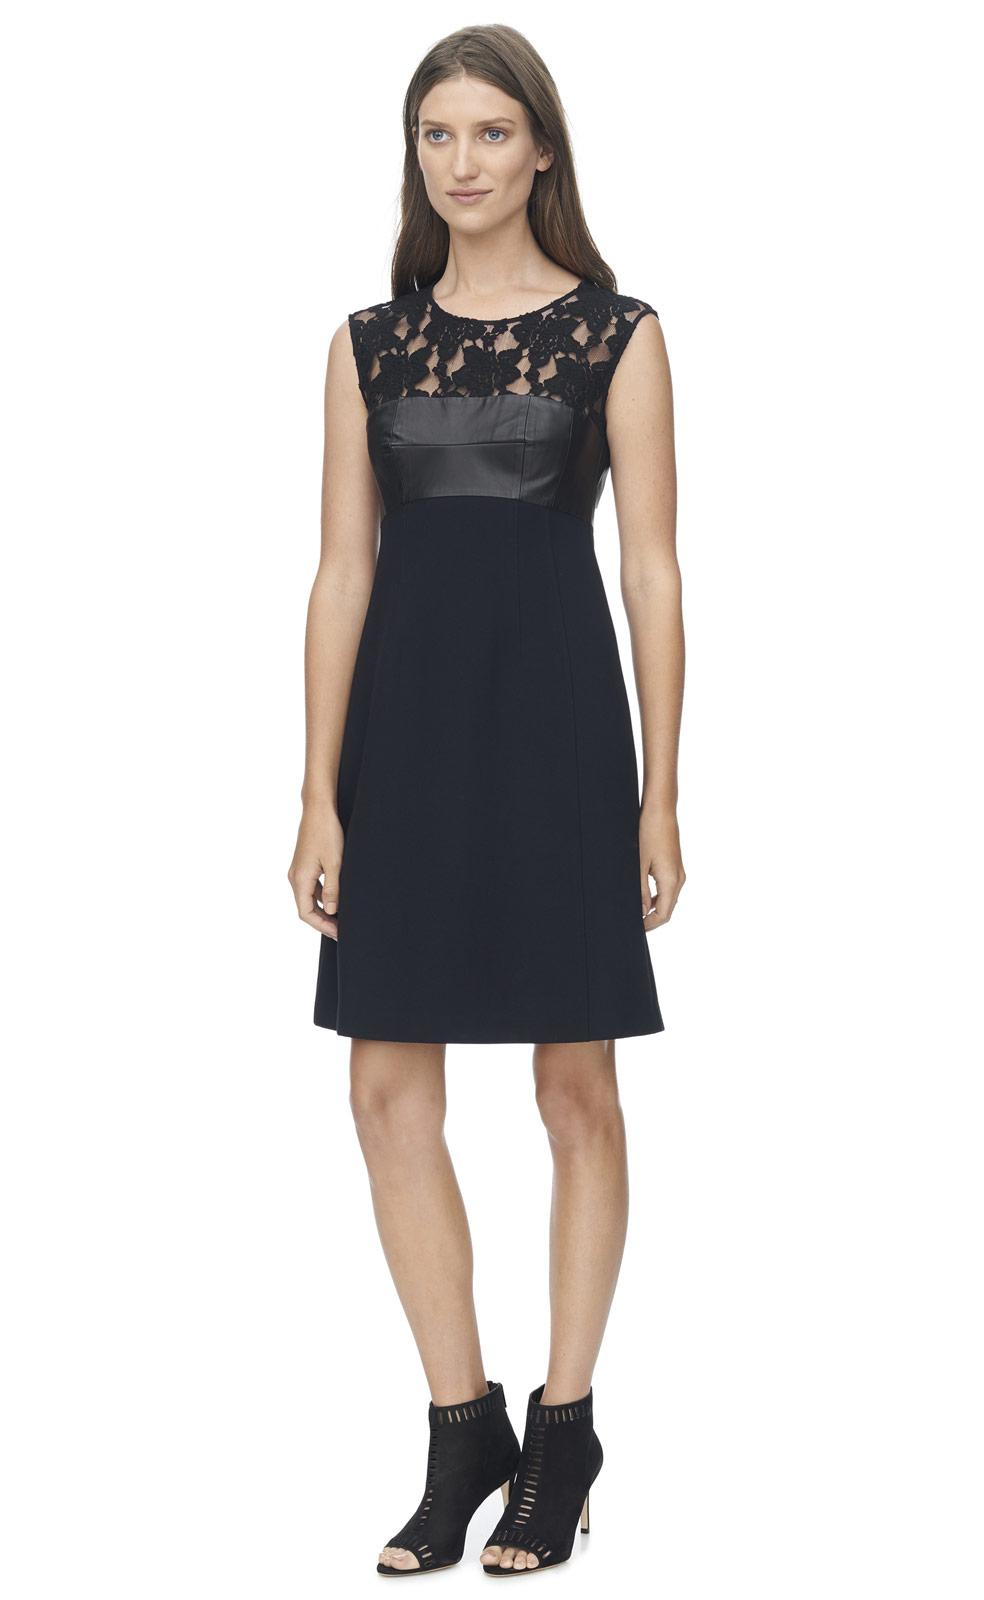 Black lace leather dress